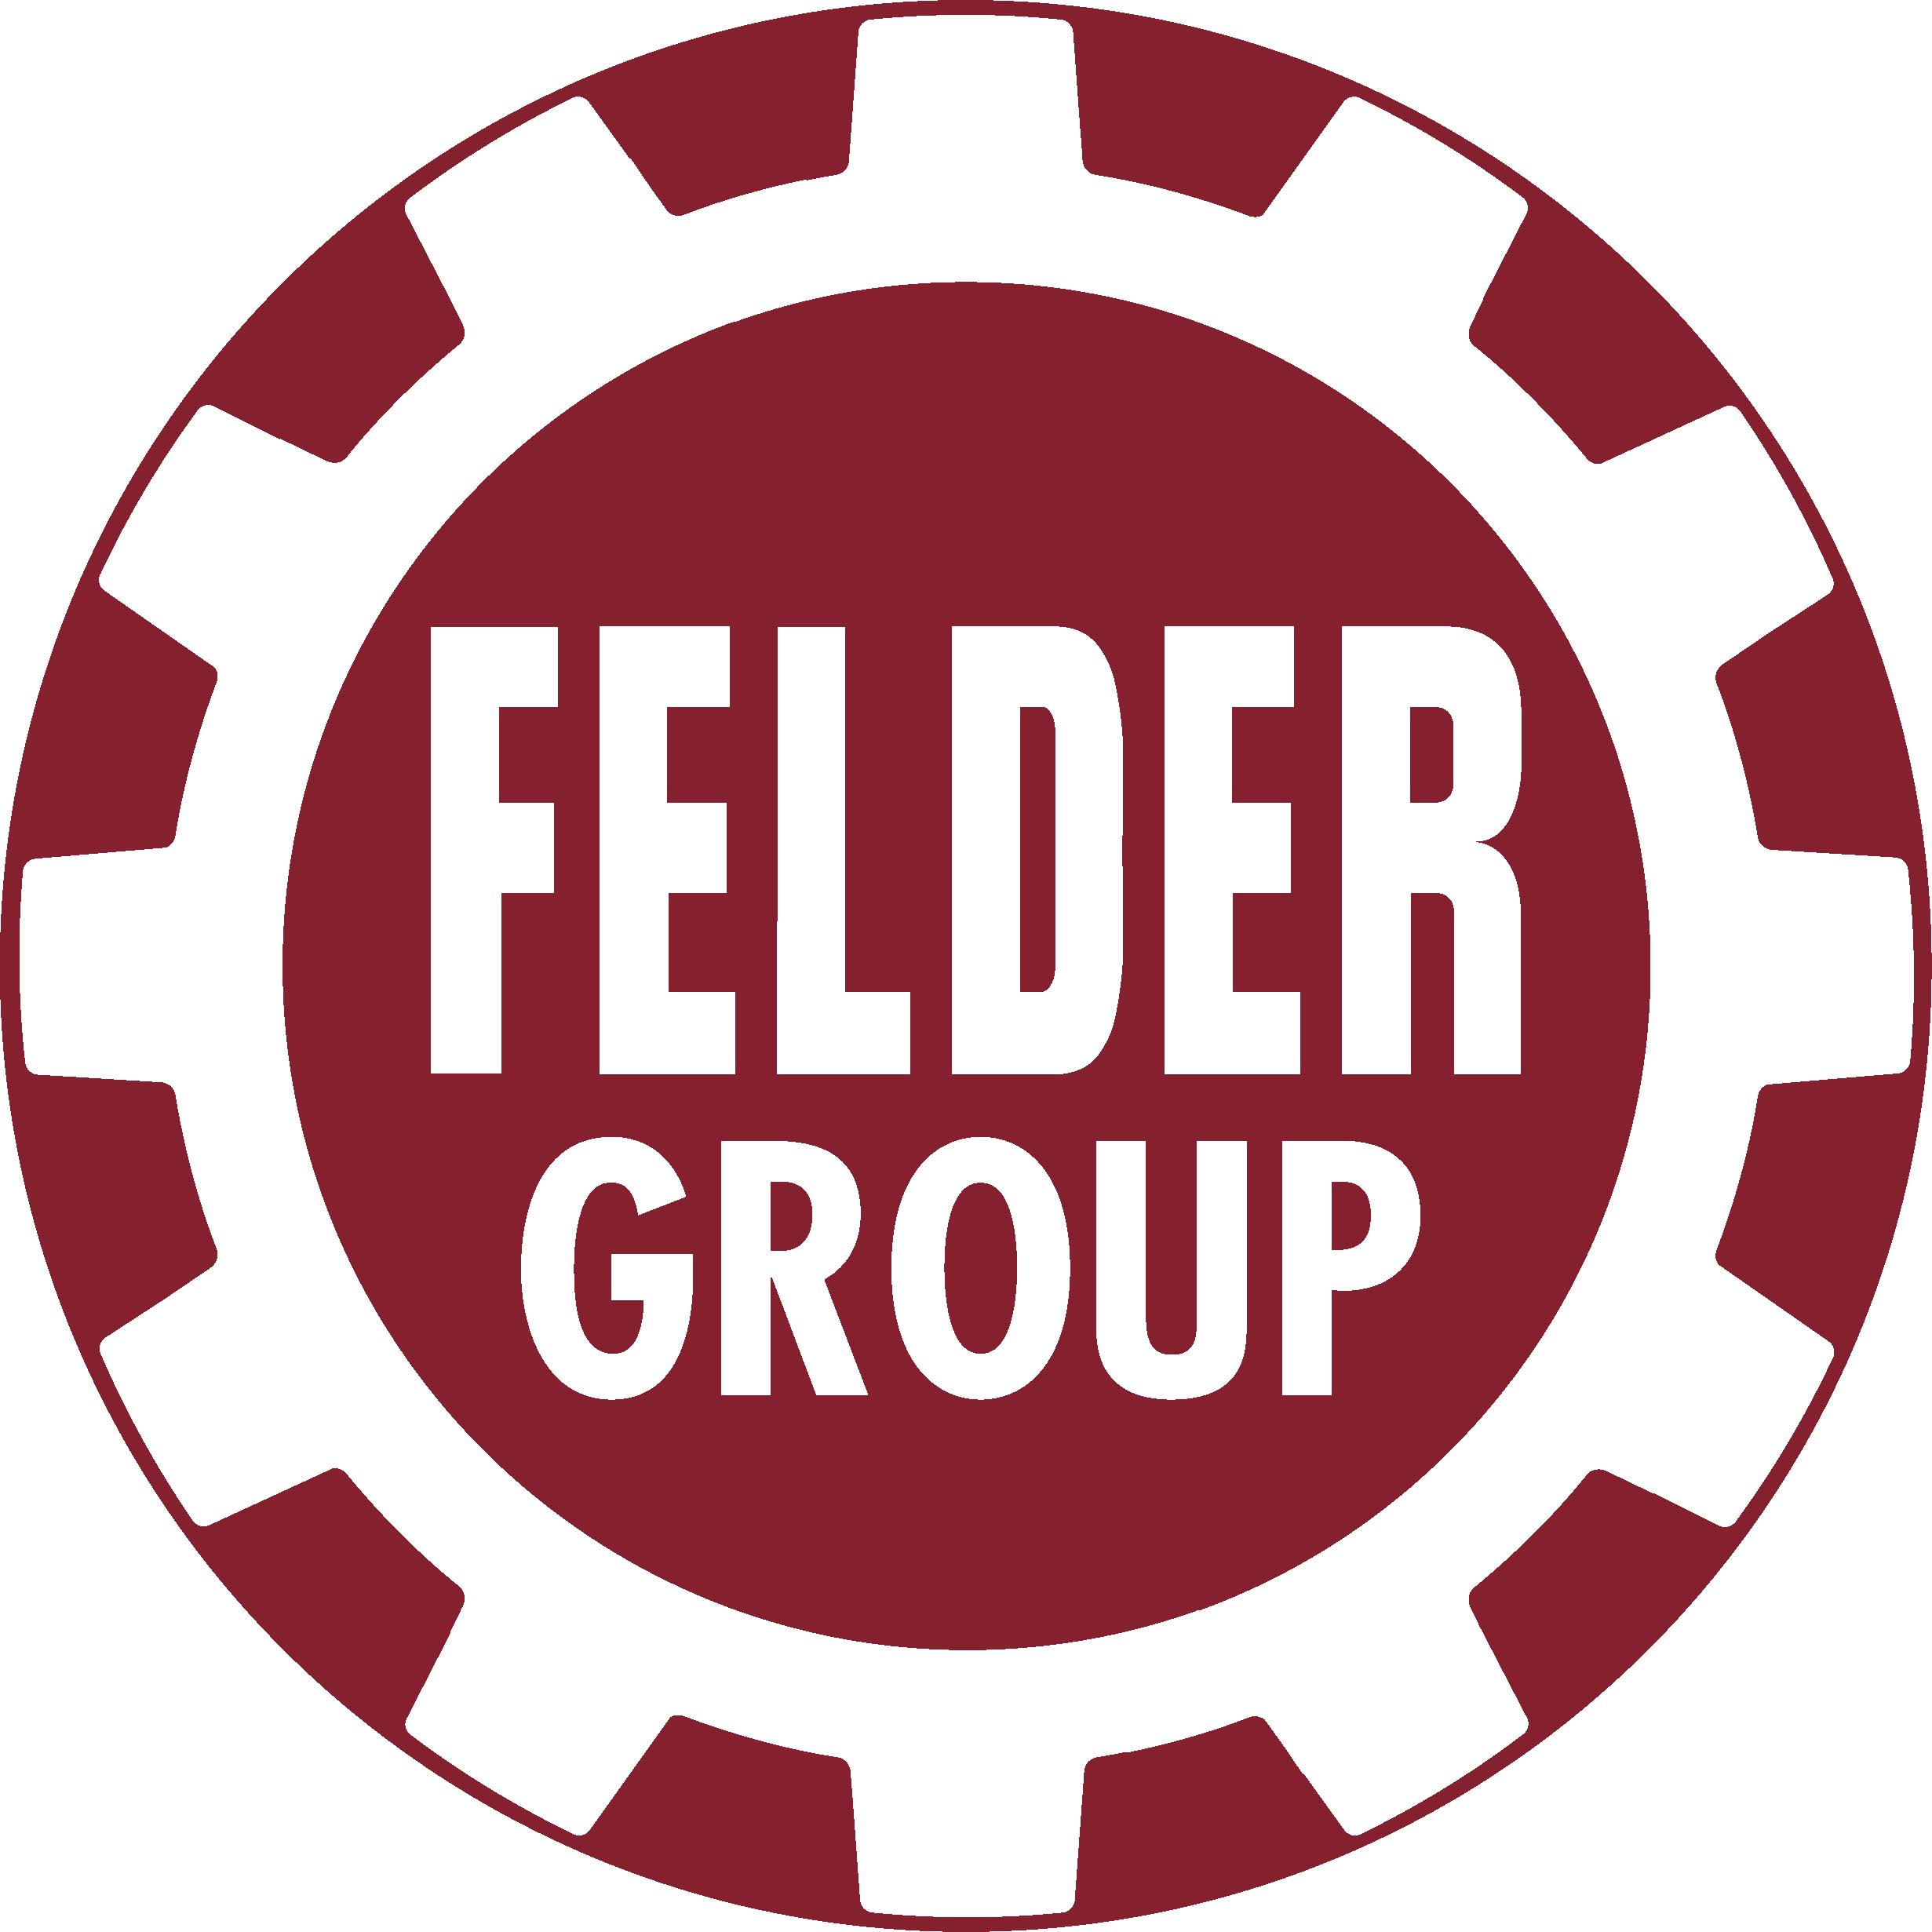 Máy gỗ Châu Âu Felder